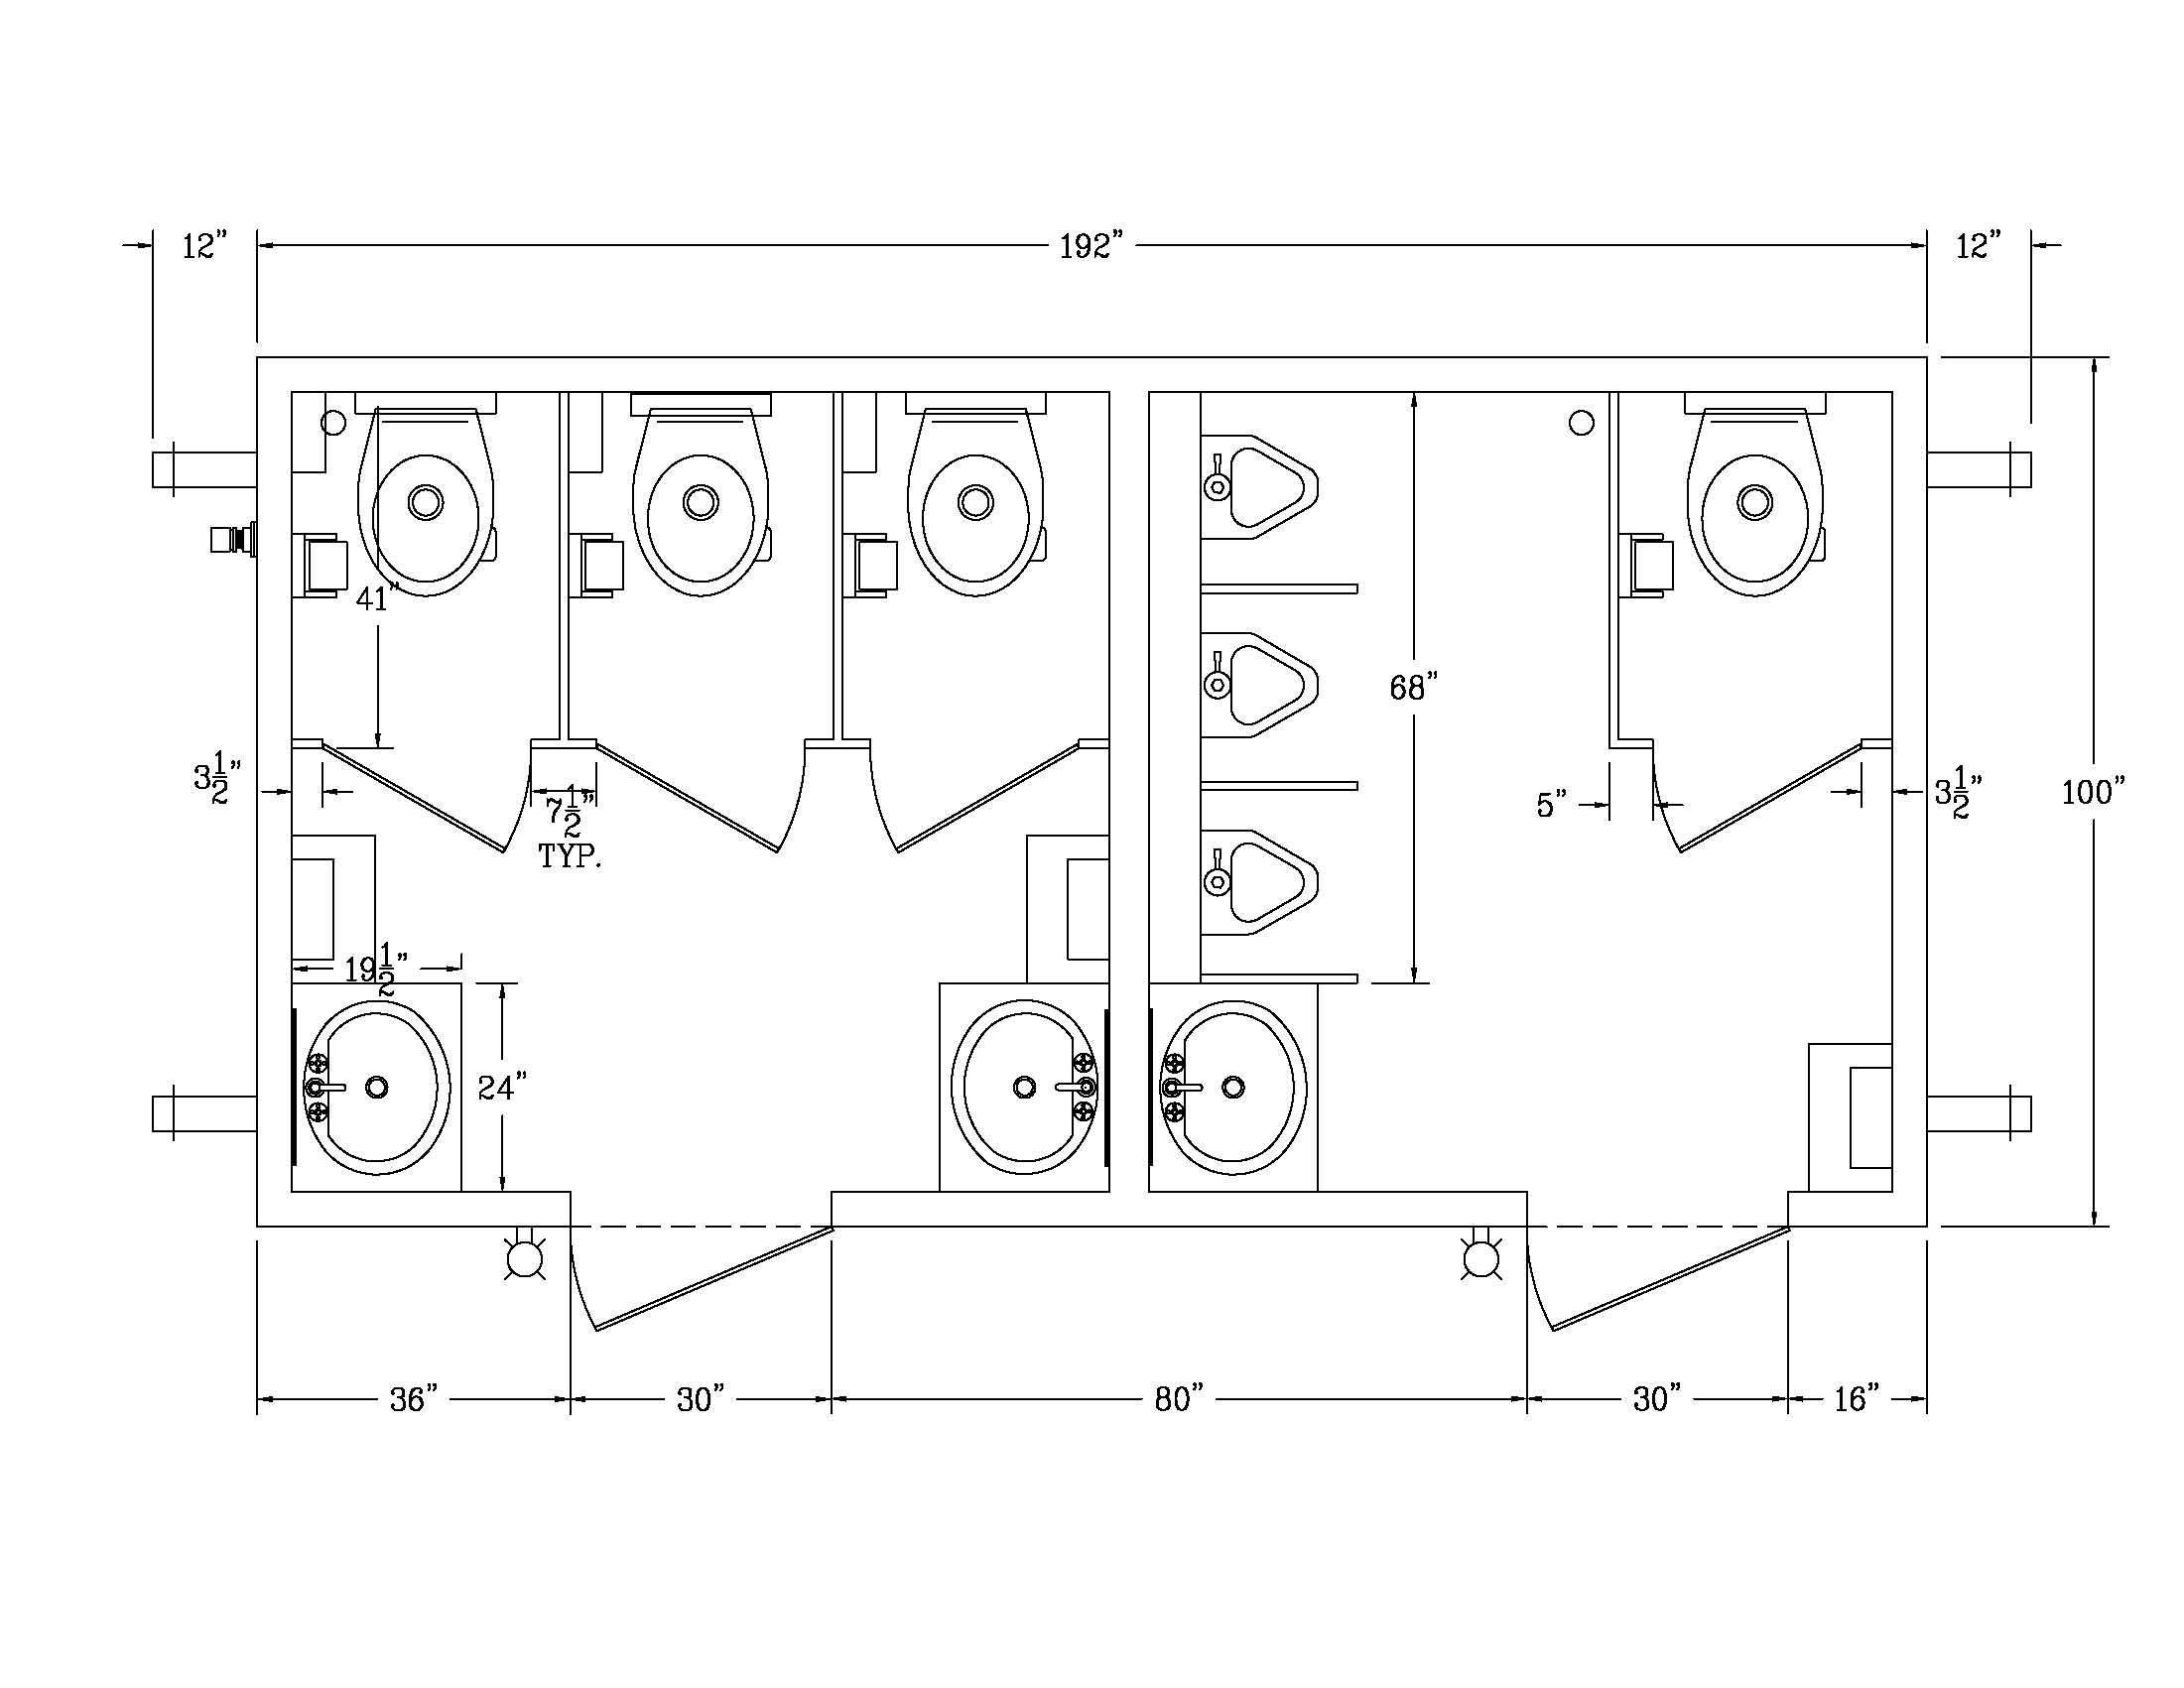 medium resolution of charming bathroom stall dimensions part 1 public bathroom stall dimensions